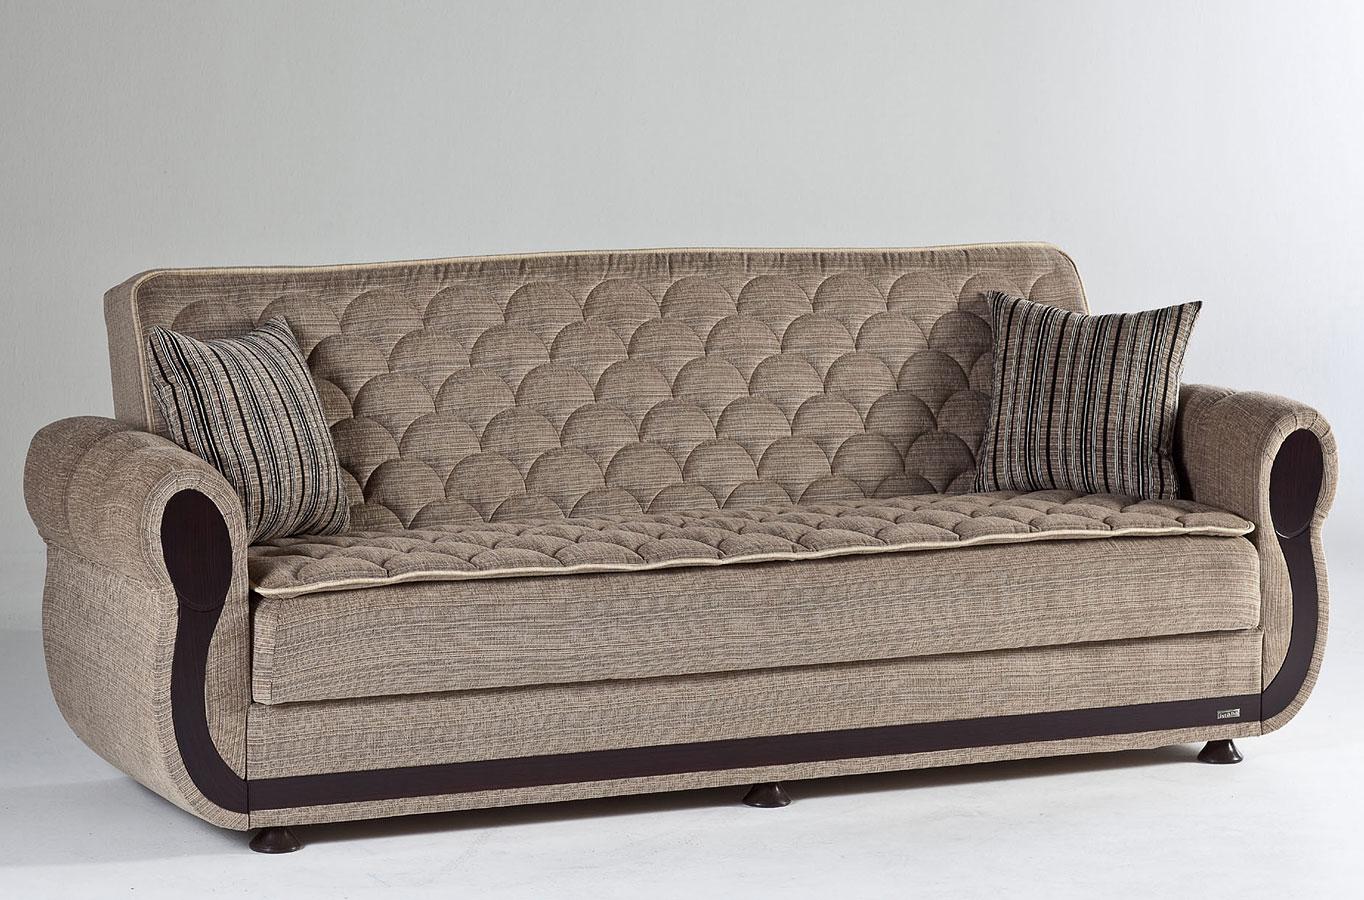 Outstanding Argos 3 Seat Sleeper Zilkade L Brown Download Free Architecture Designs Terstmadebymaigaardcom